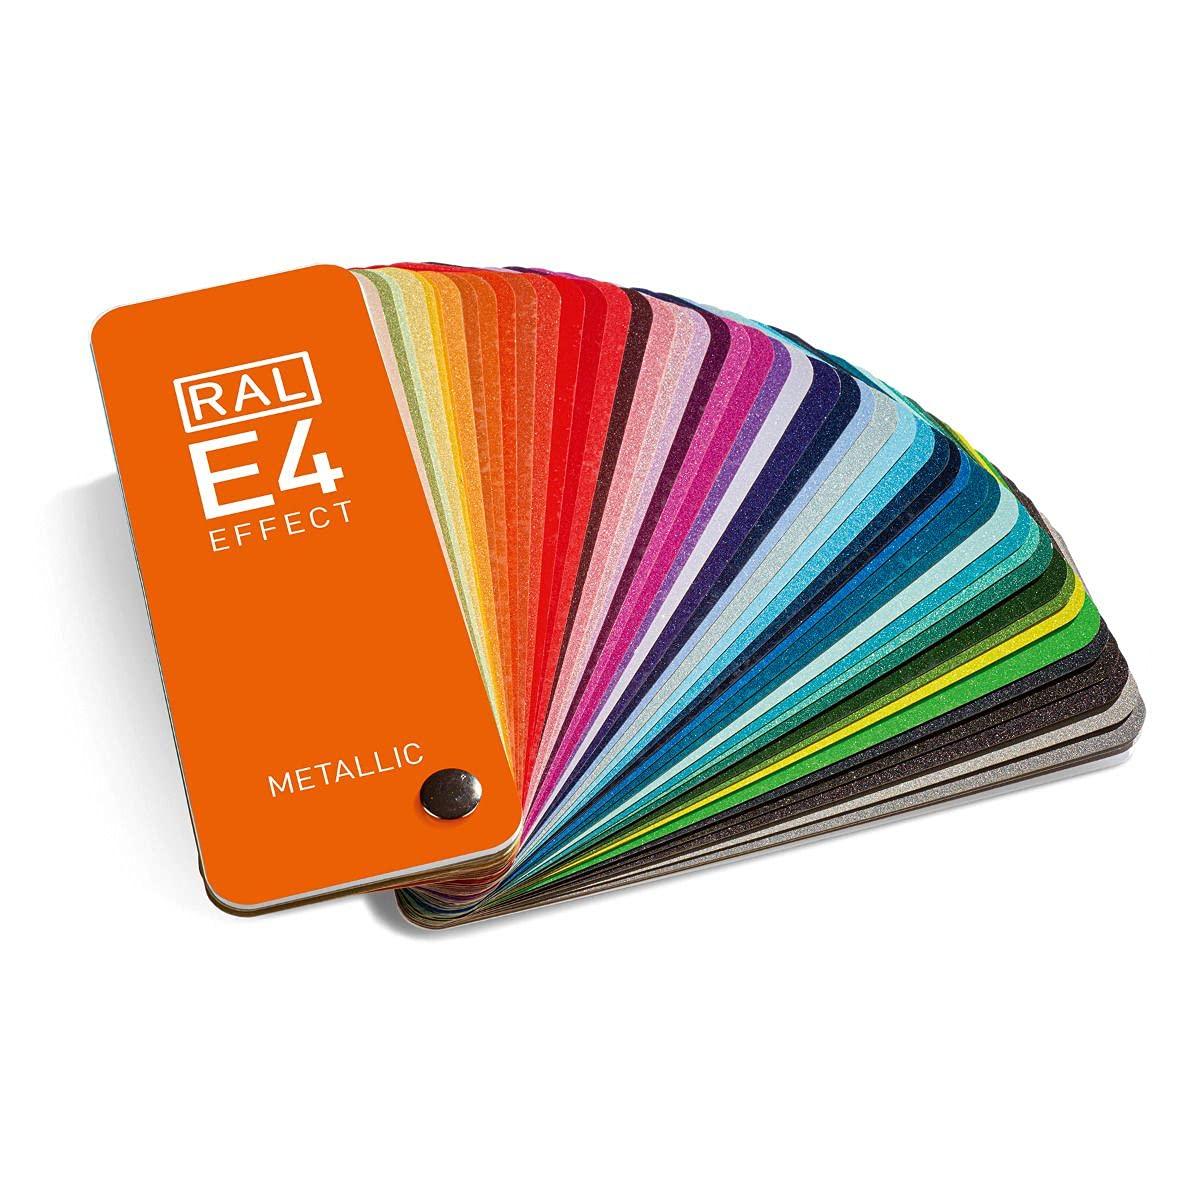 RAL E4 EFFECT colour fan glossy metallic